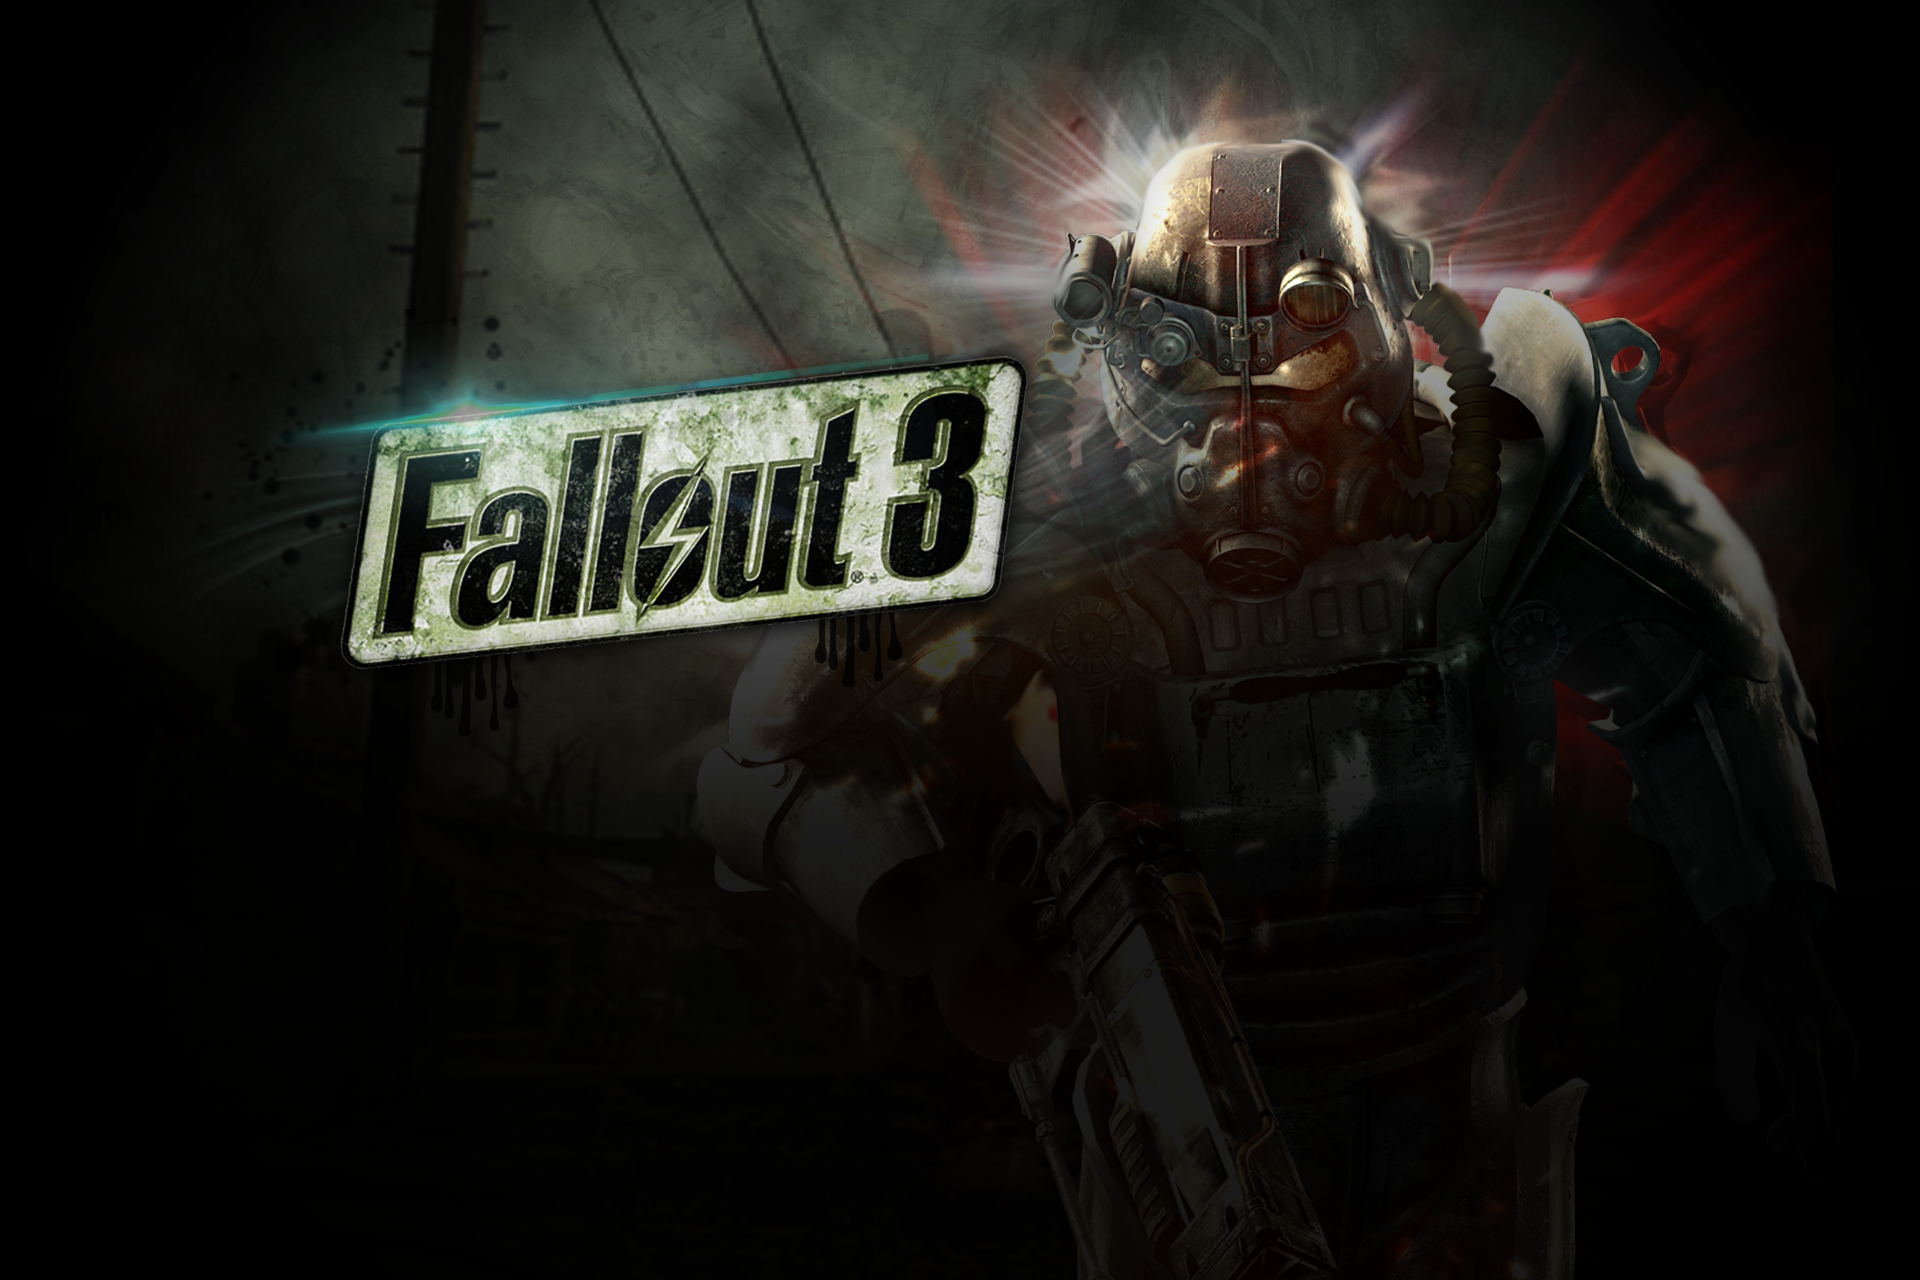 Fallout 3 Desktop Background By Kamilakamek On Deviantart